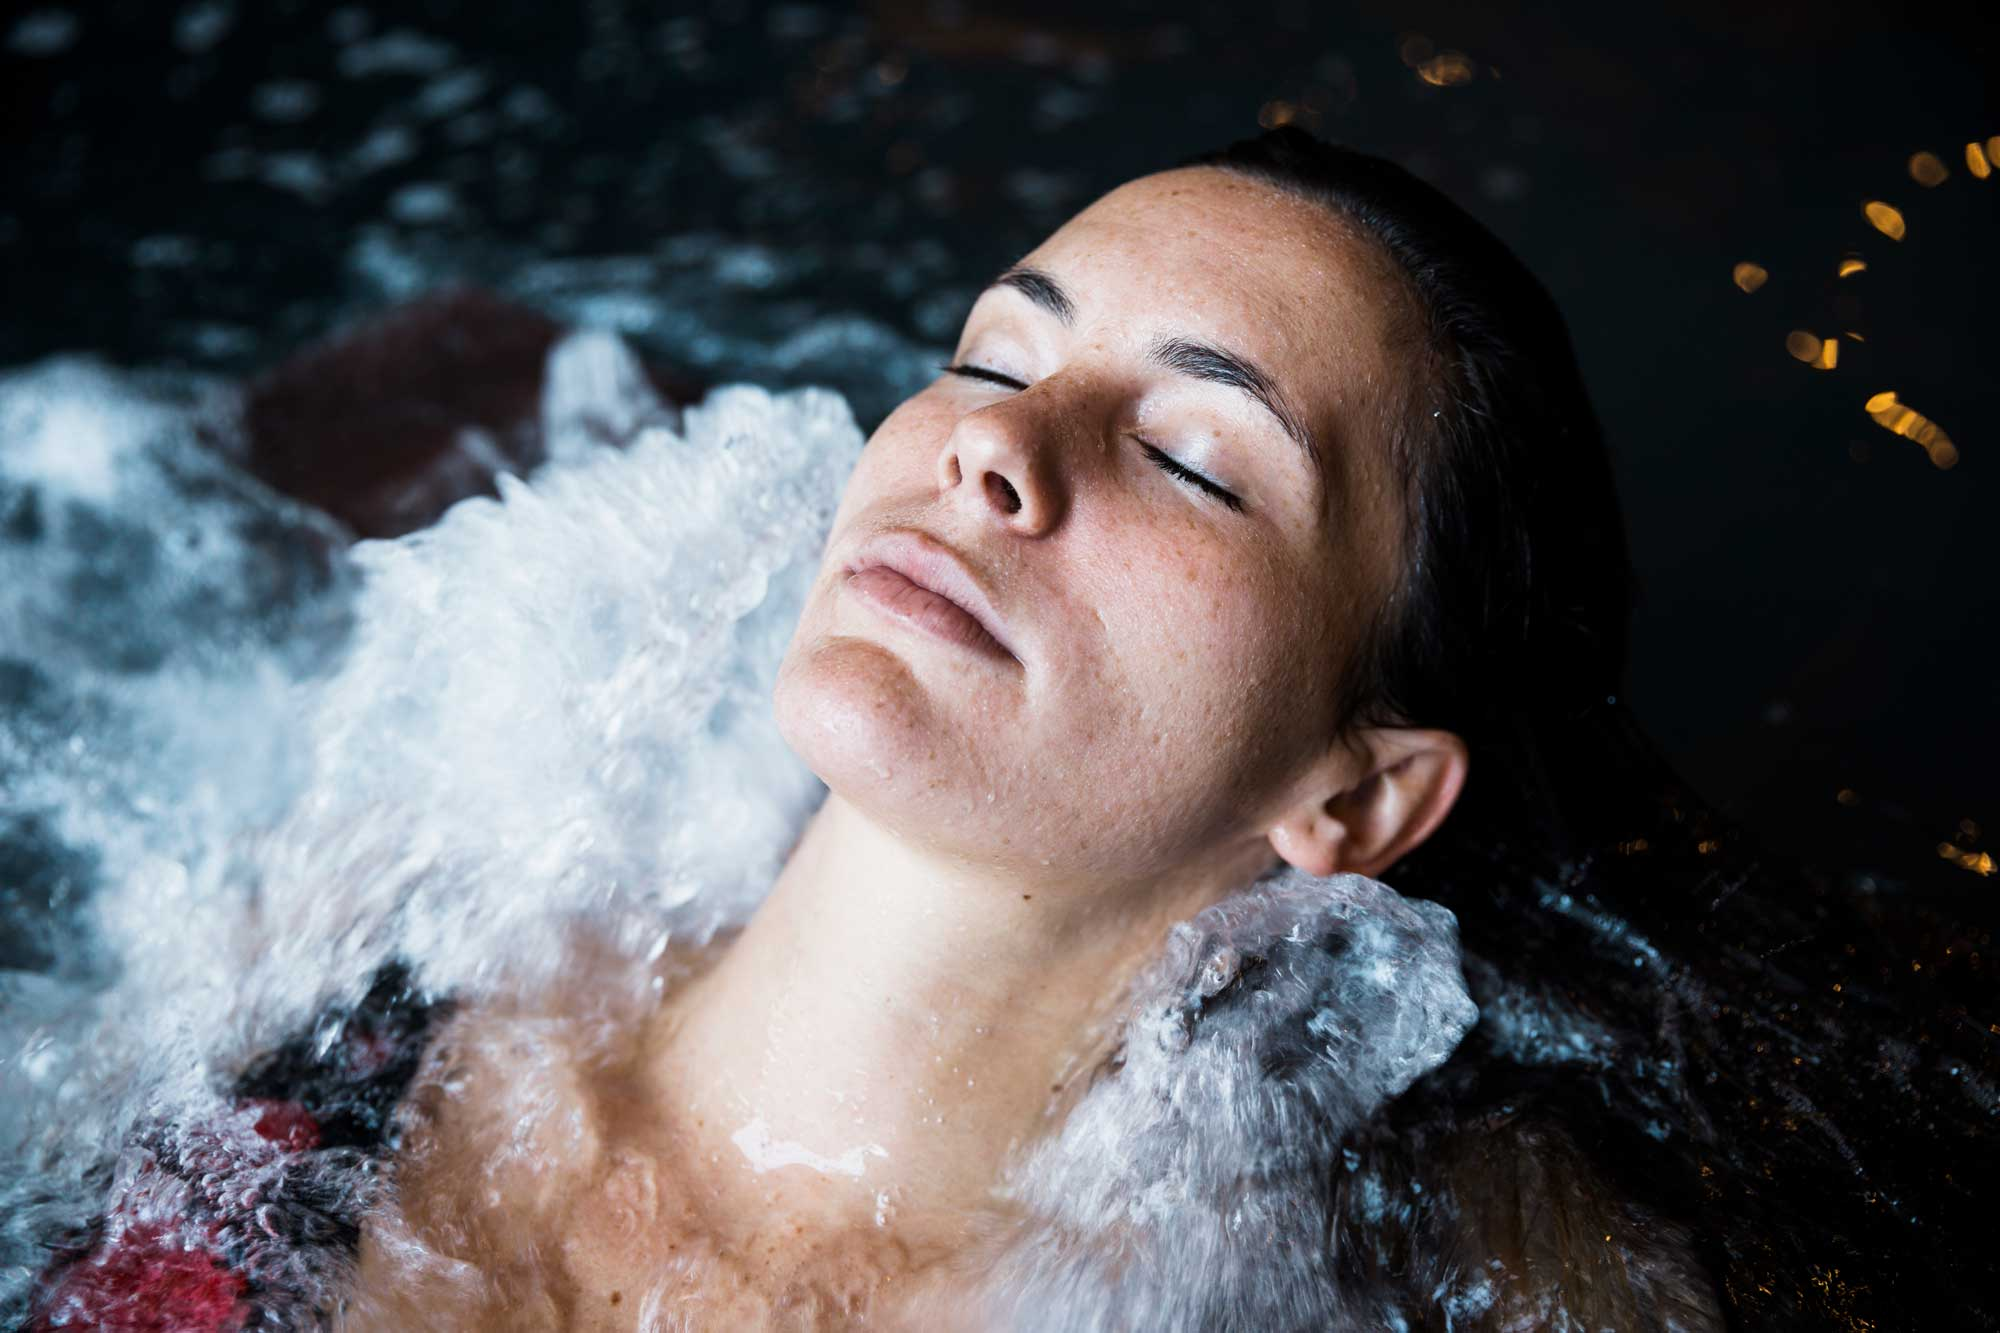 woman-relaxing-whirlpool